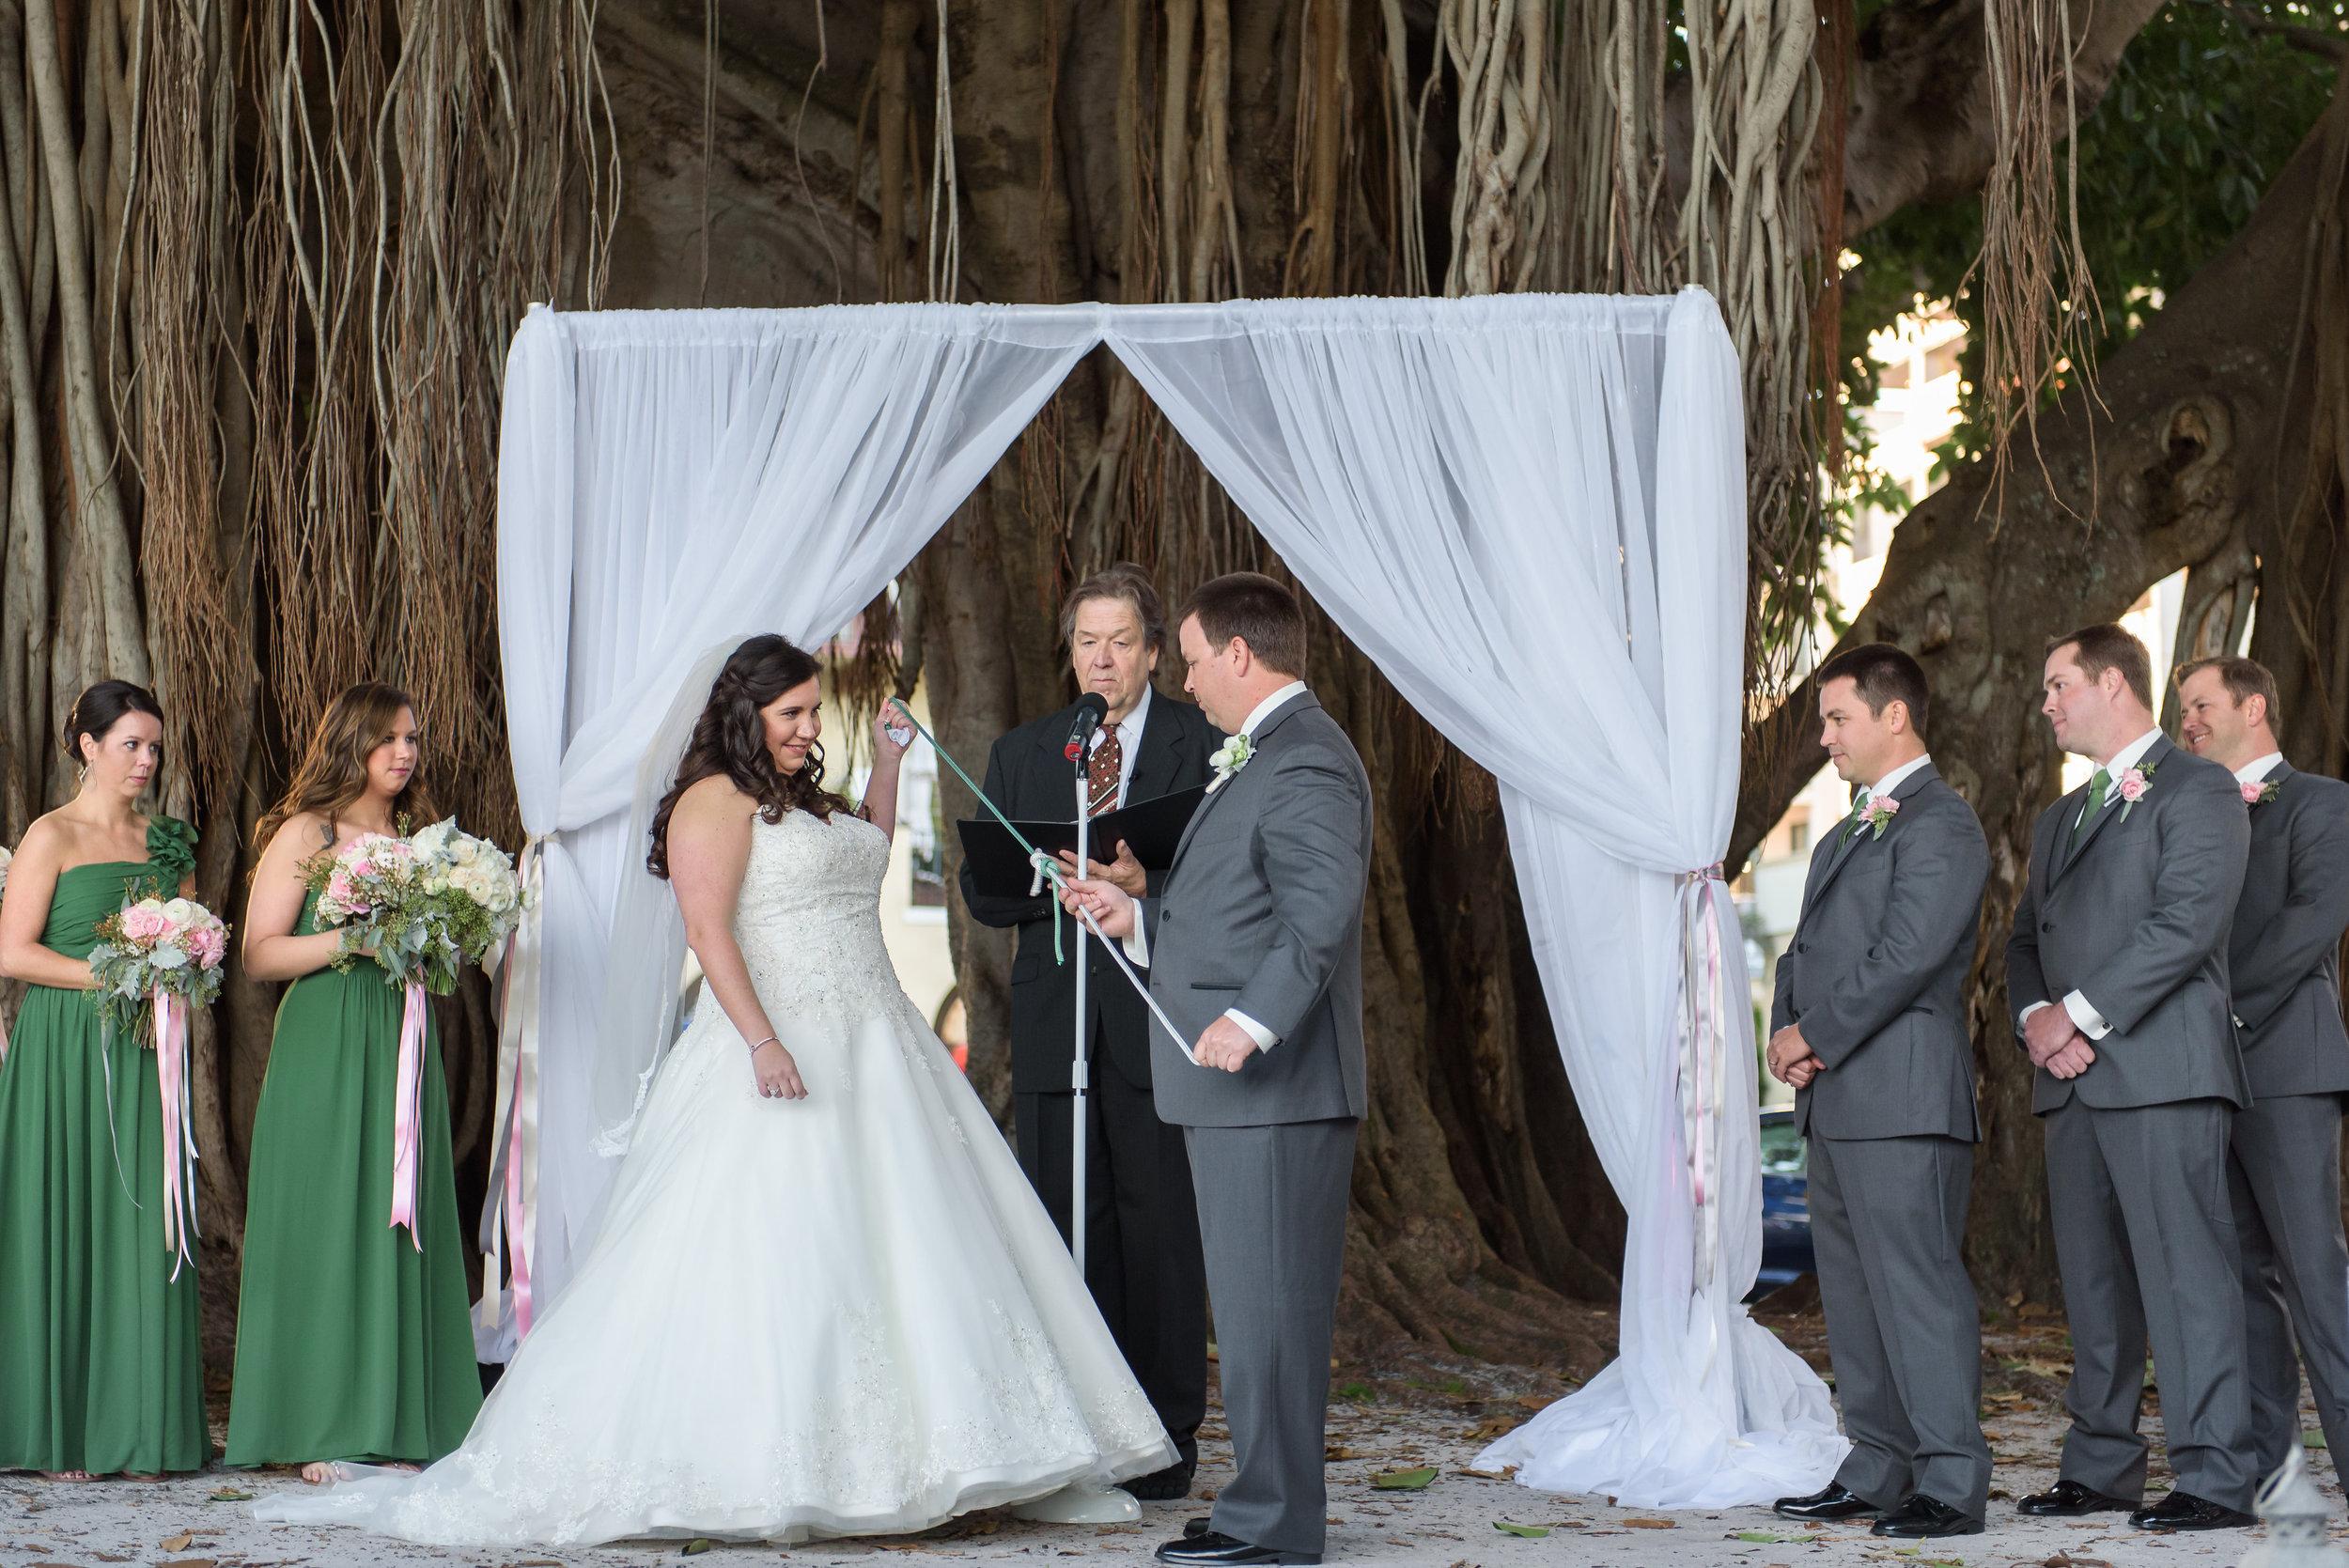 winsor event studio wedding knot tying unity ceremony